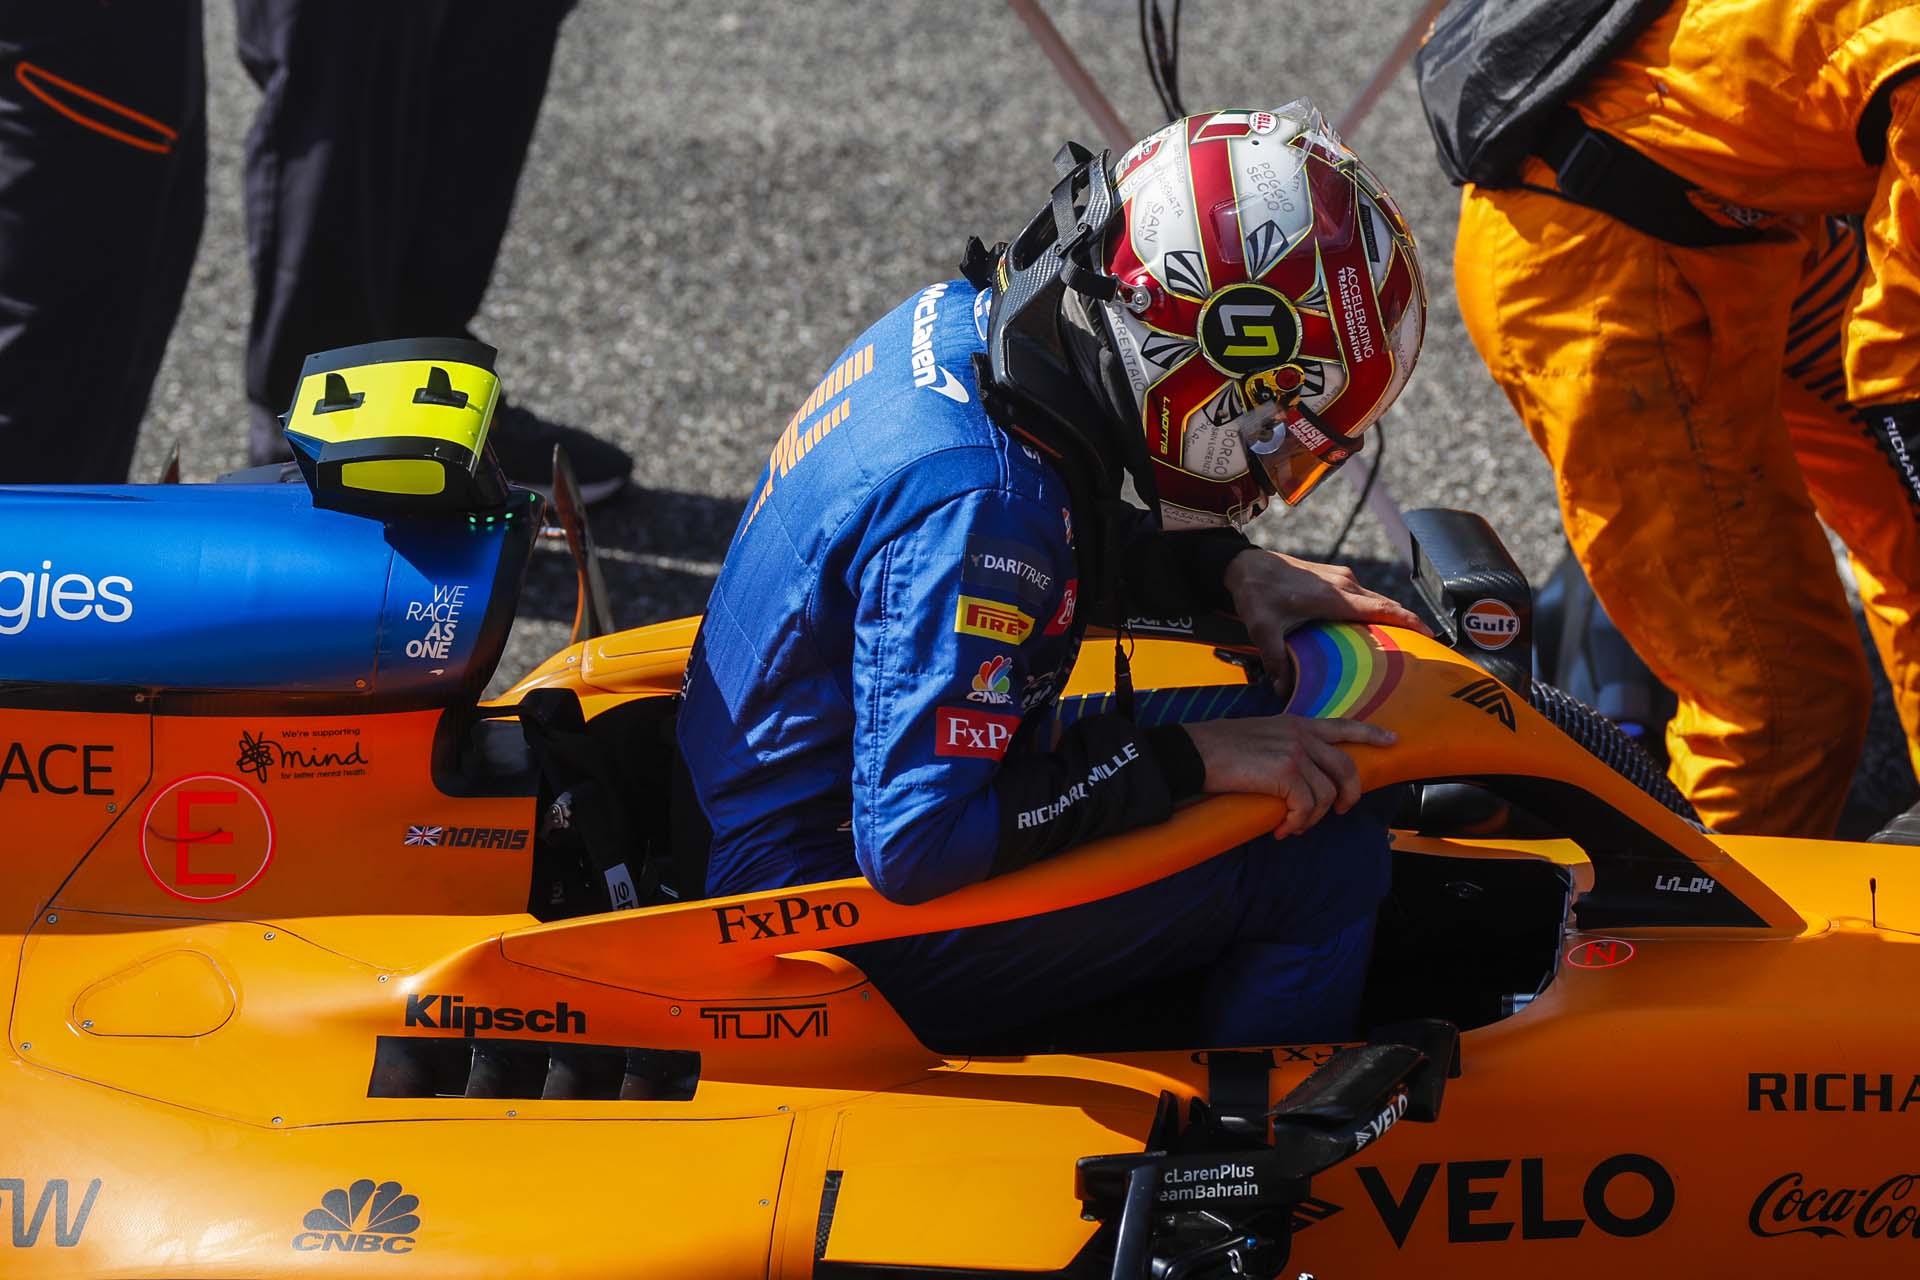 Lando Norris, McLaren, exits his cockpit on the grid